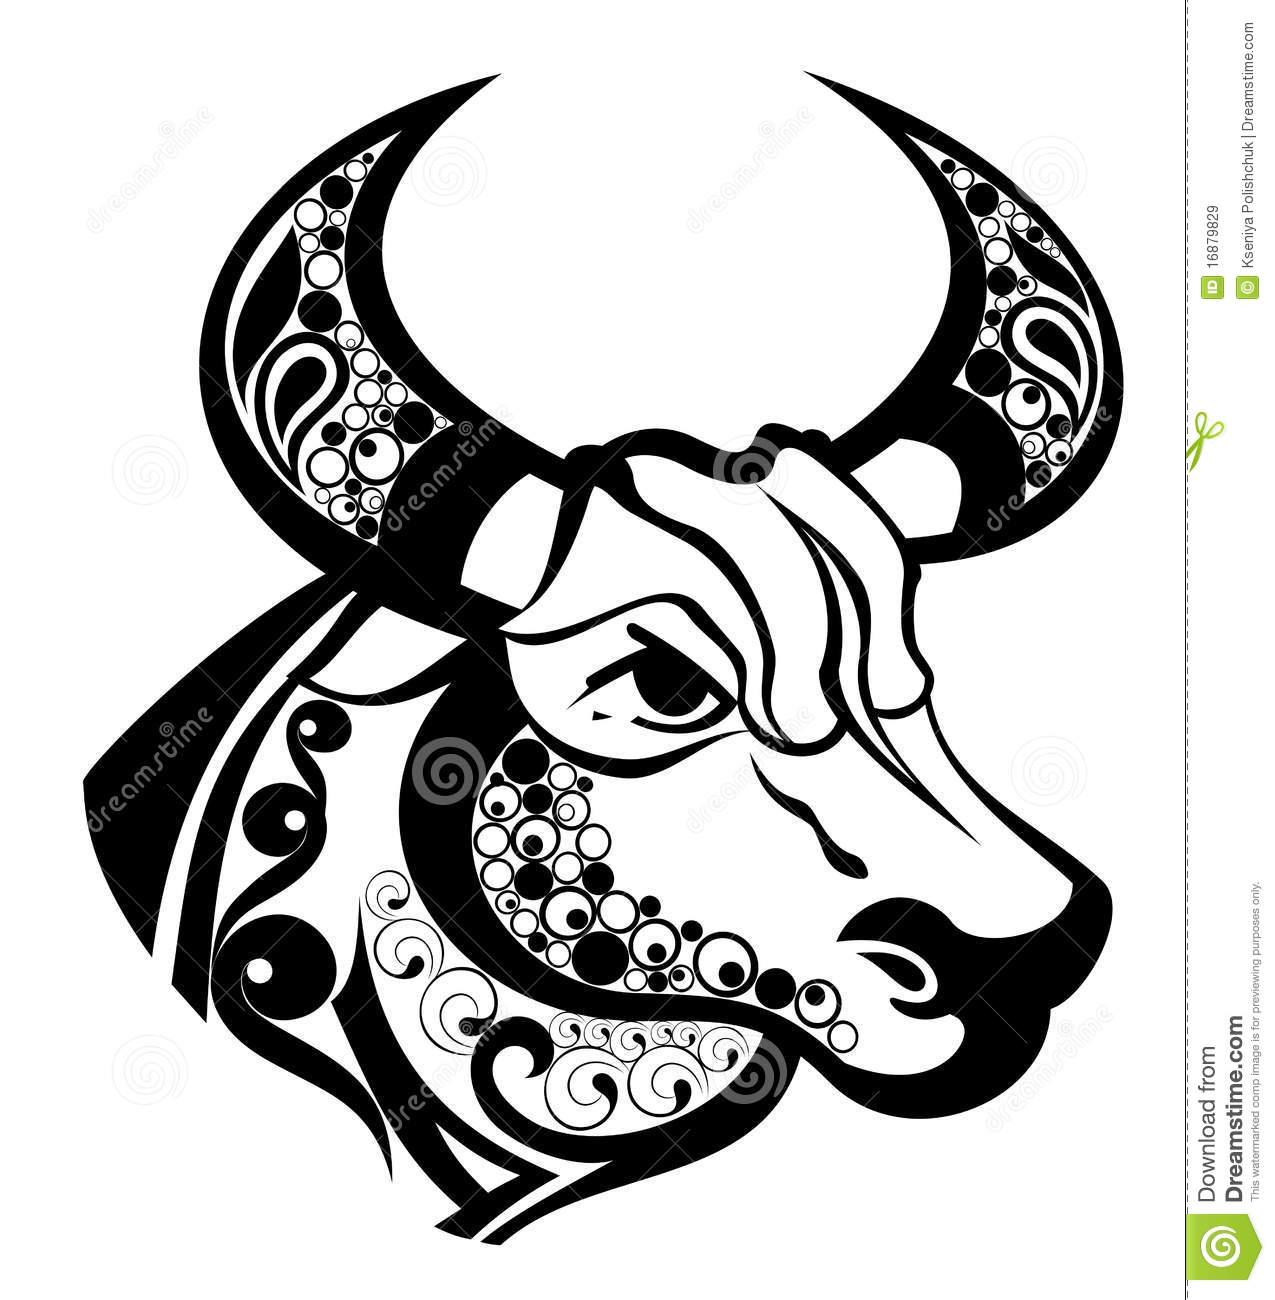 50+ Zodiac Sign Tattoos Designs